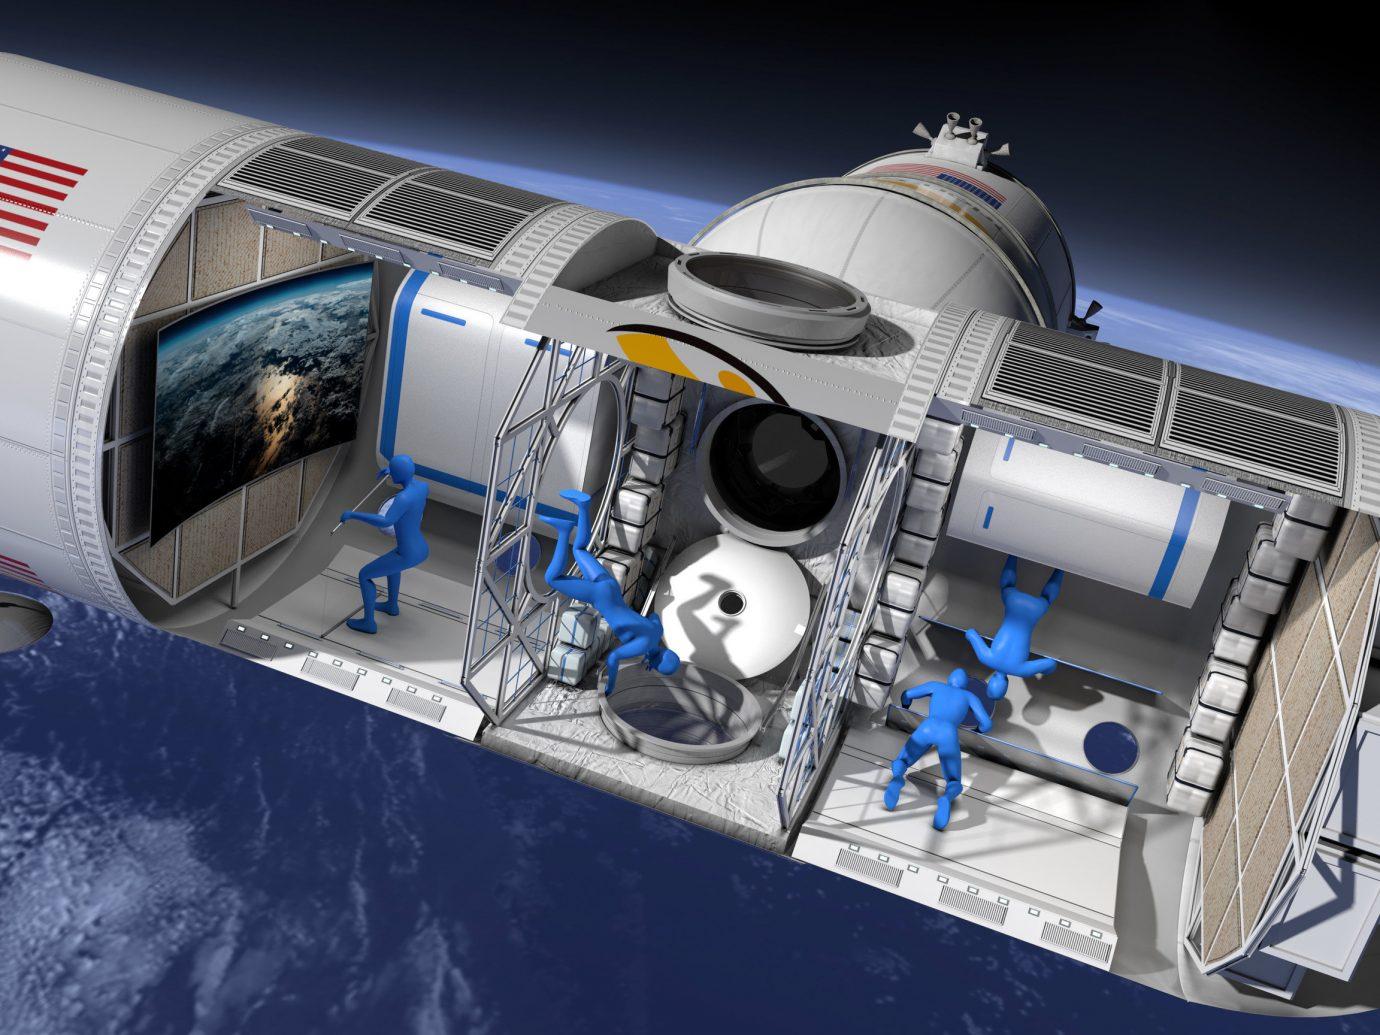 Hotels News Offbeat space shuttle spaceplane spacecraft jet engine aerospace engineering aircraft engine airplane aviation satellite space station space naval architecture engineering aircraft astronaut